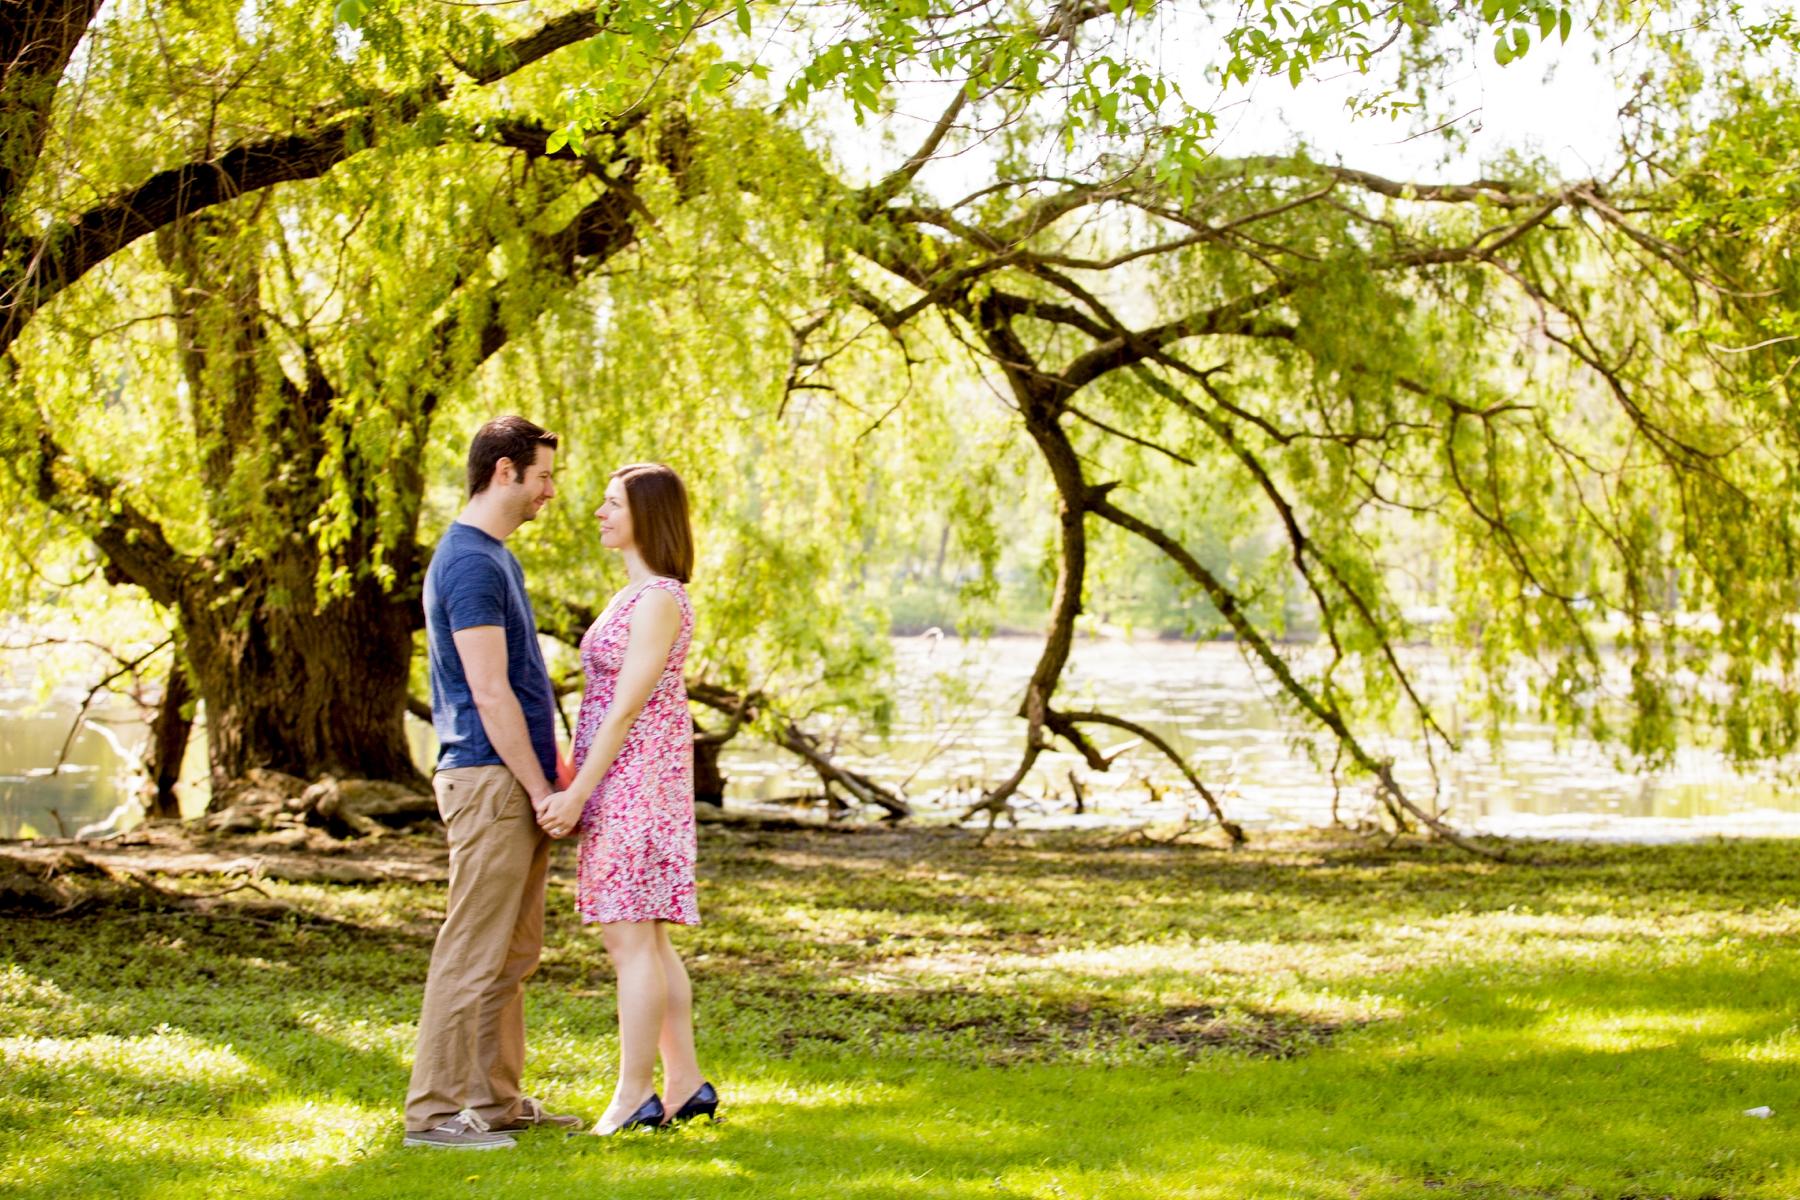 Brandon_Shafer_Photography_Michele_Chris_Michigan_Grand_Rapids_City_Engagement_0018.jpg